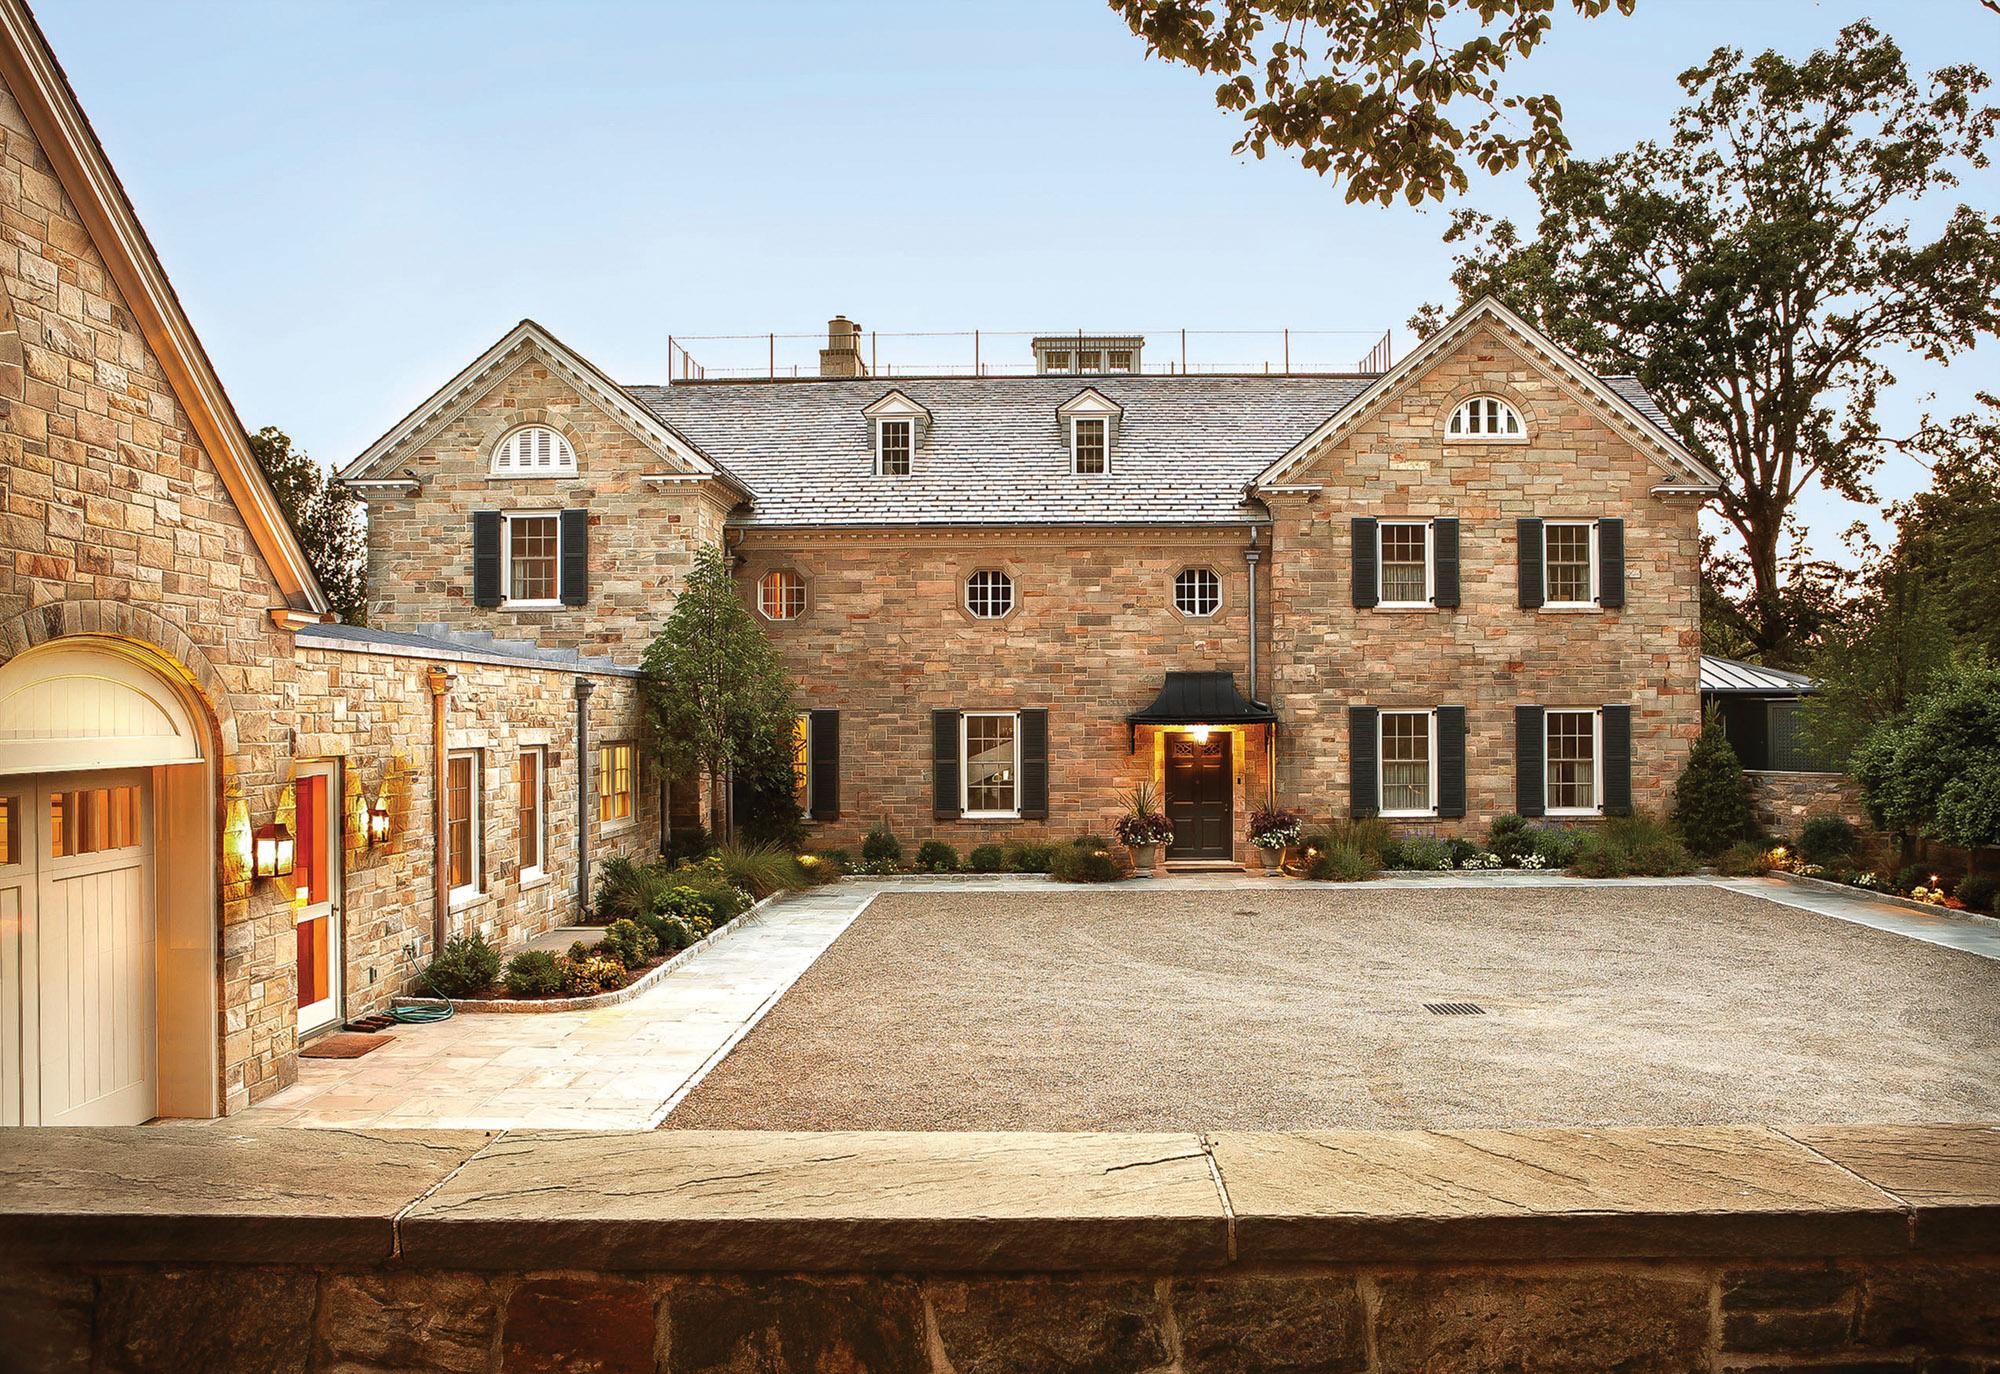 Briarcliff Manor